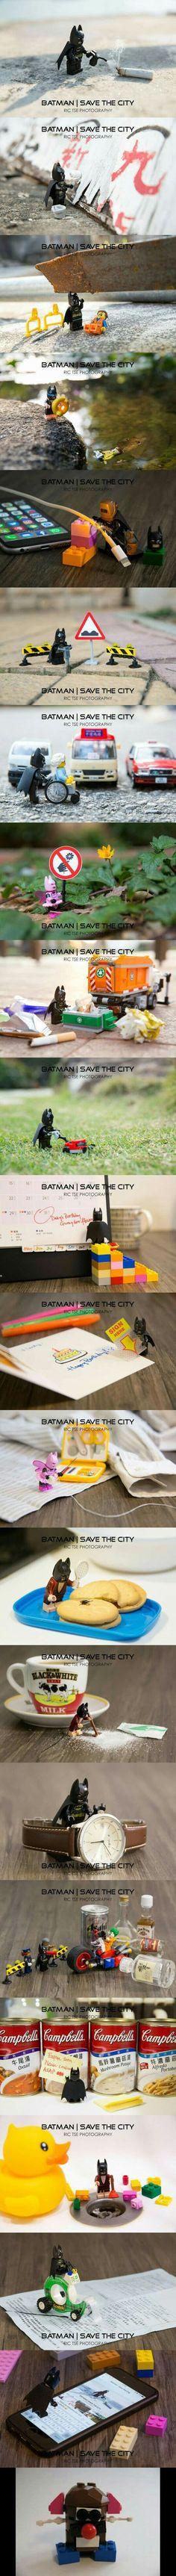 Lego BM savin' the City